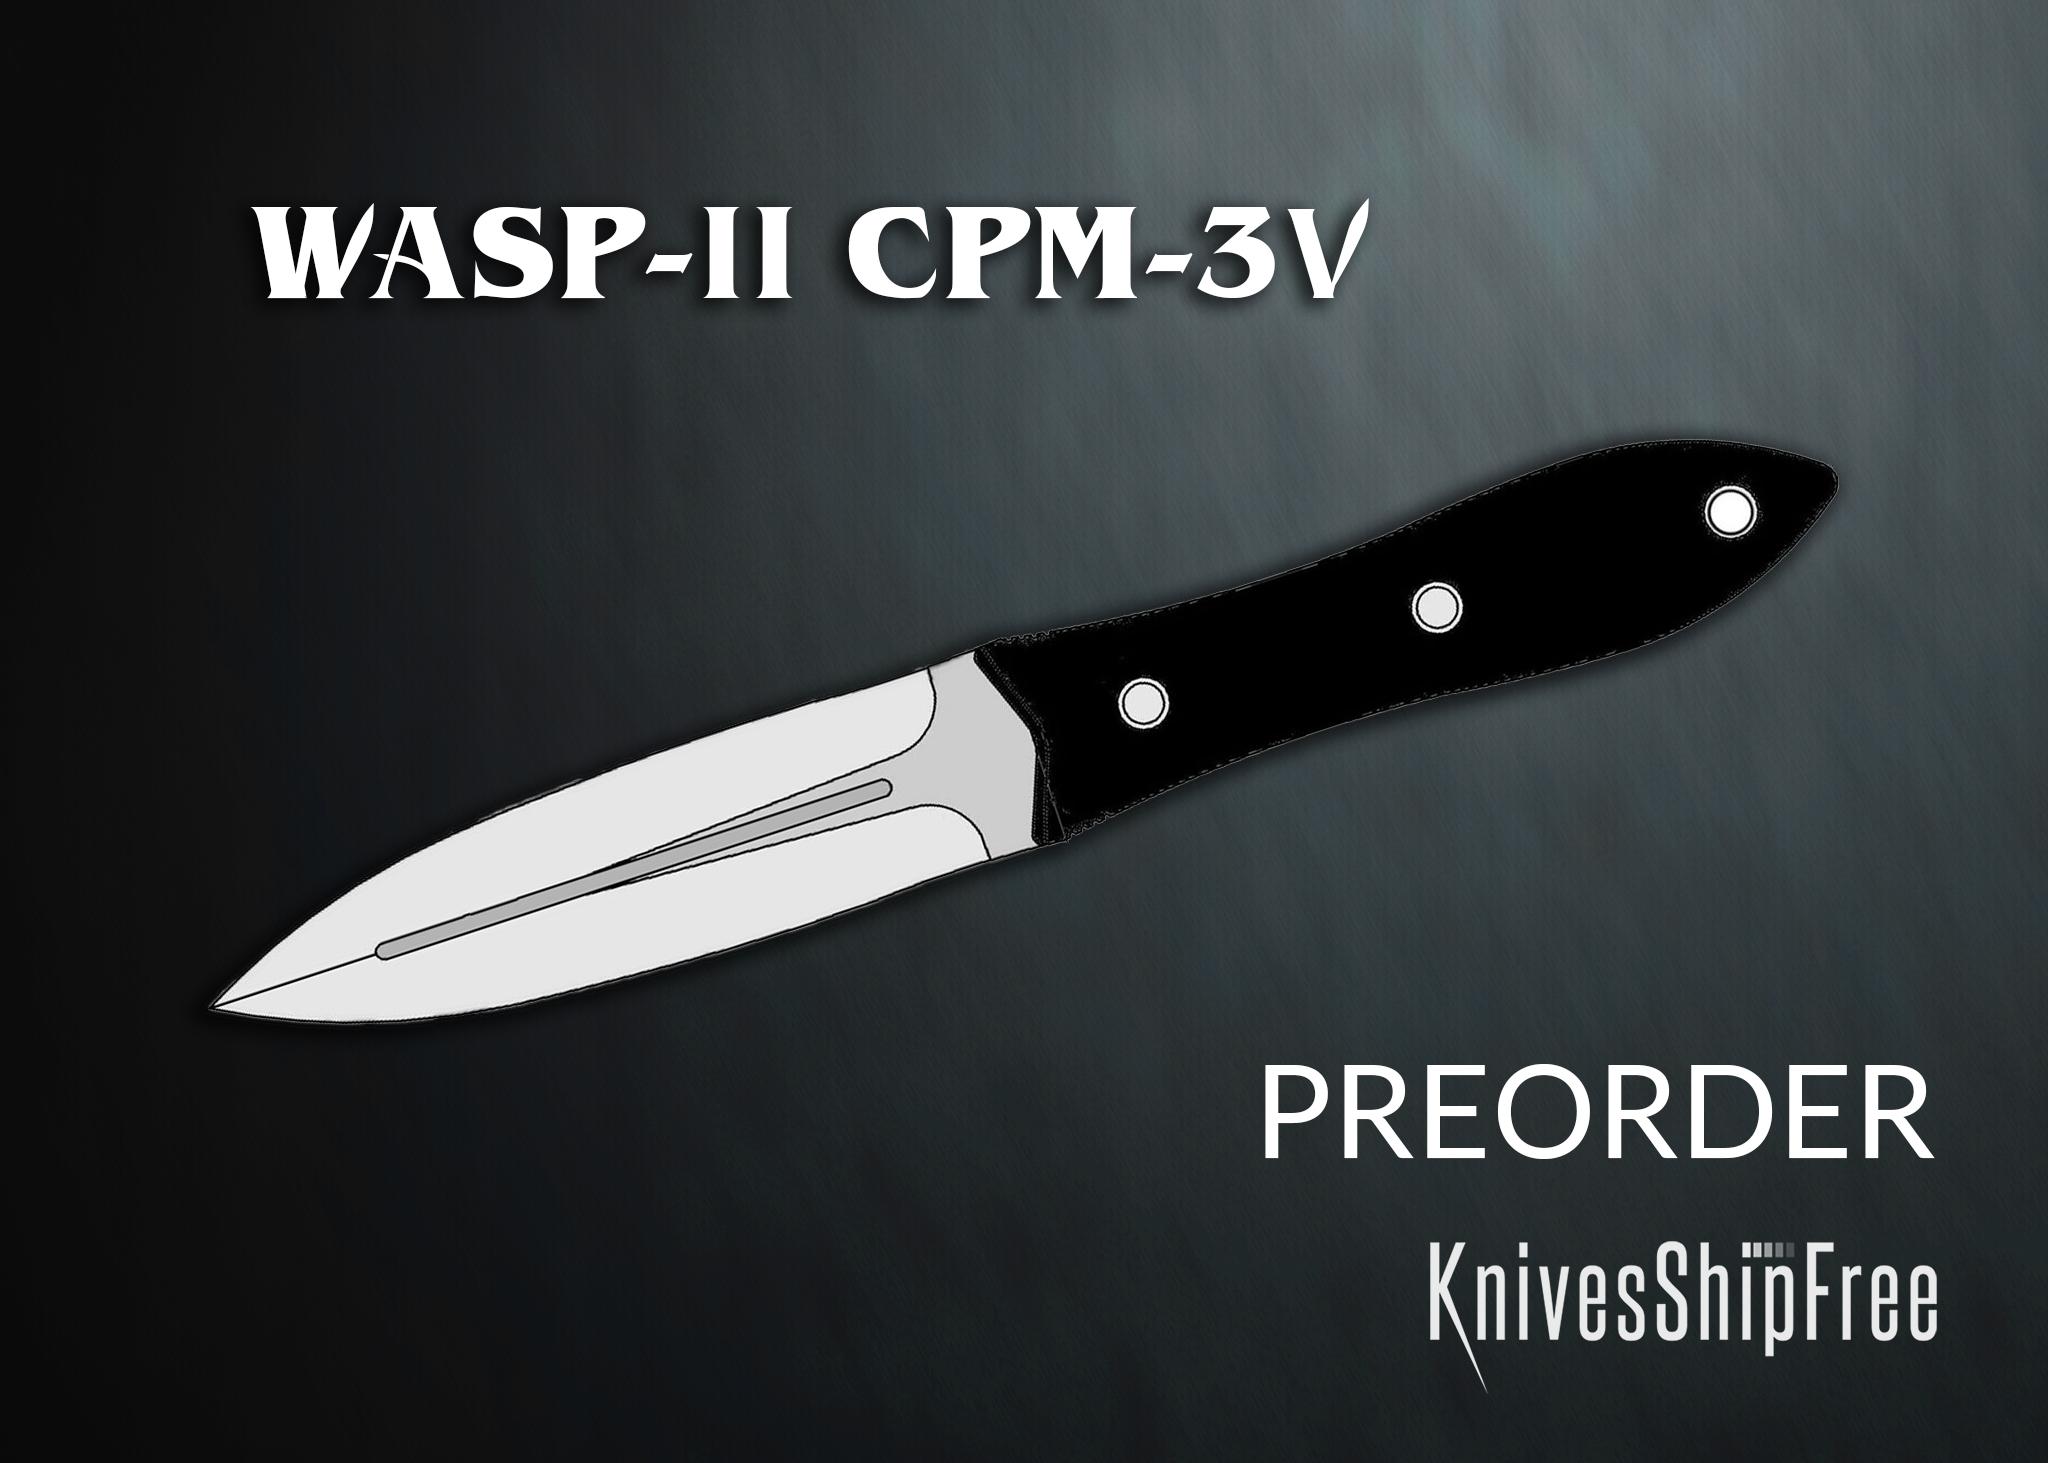 wasp-ii-preorder.jpg